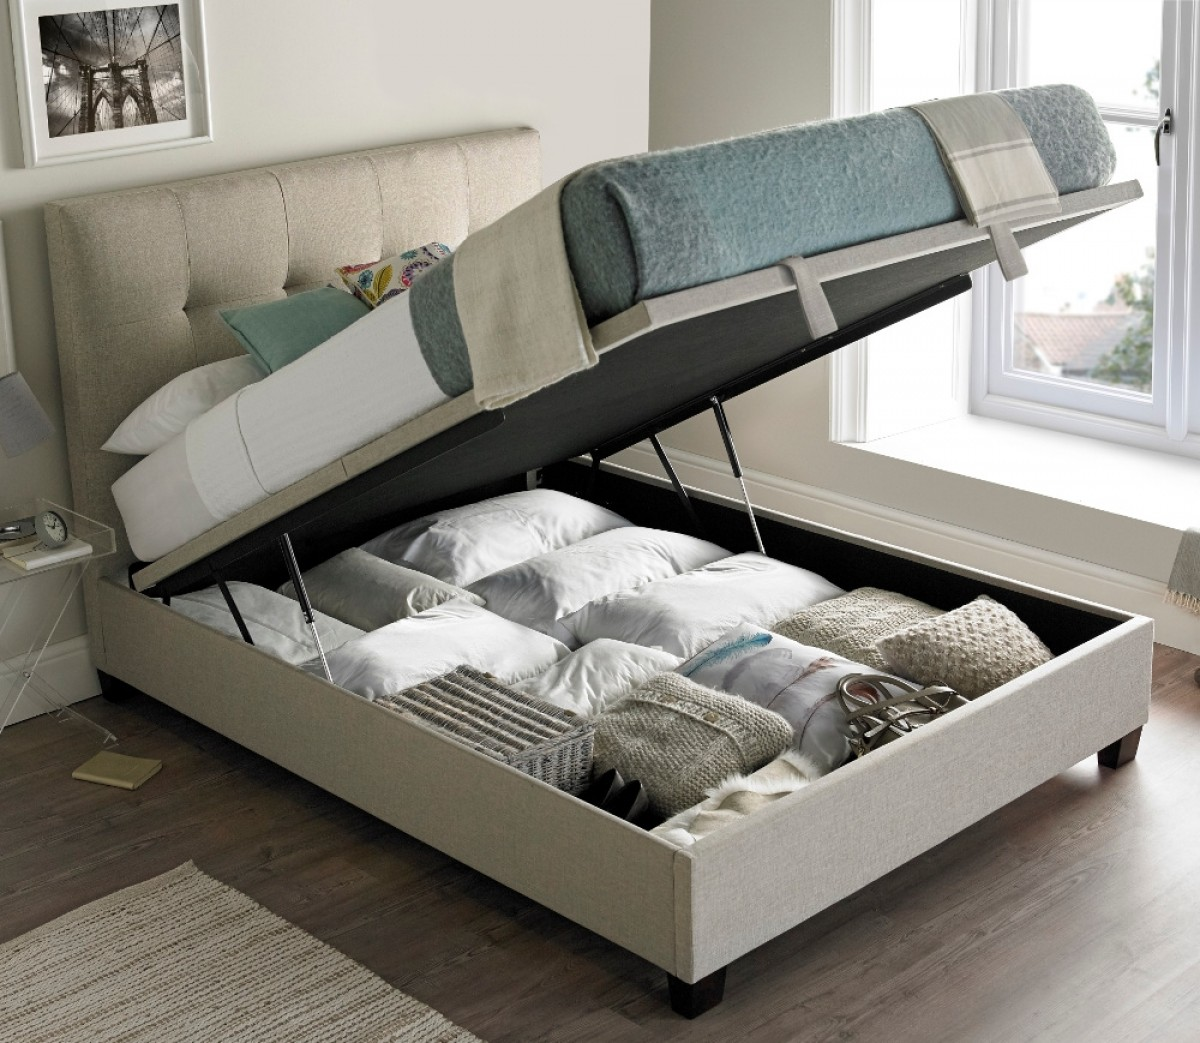 Walkworth Oatmeal Fabric Ottoman Storage Bed